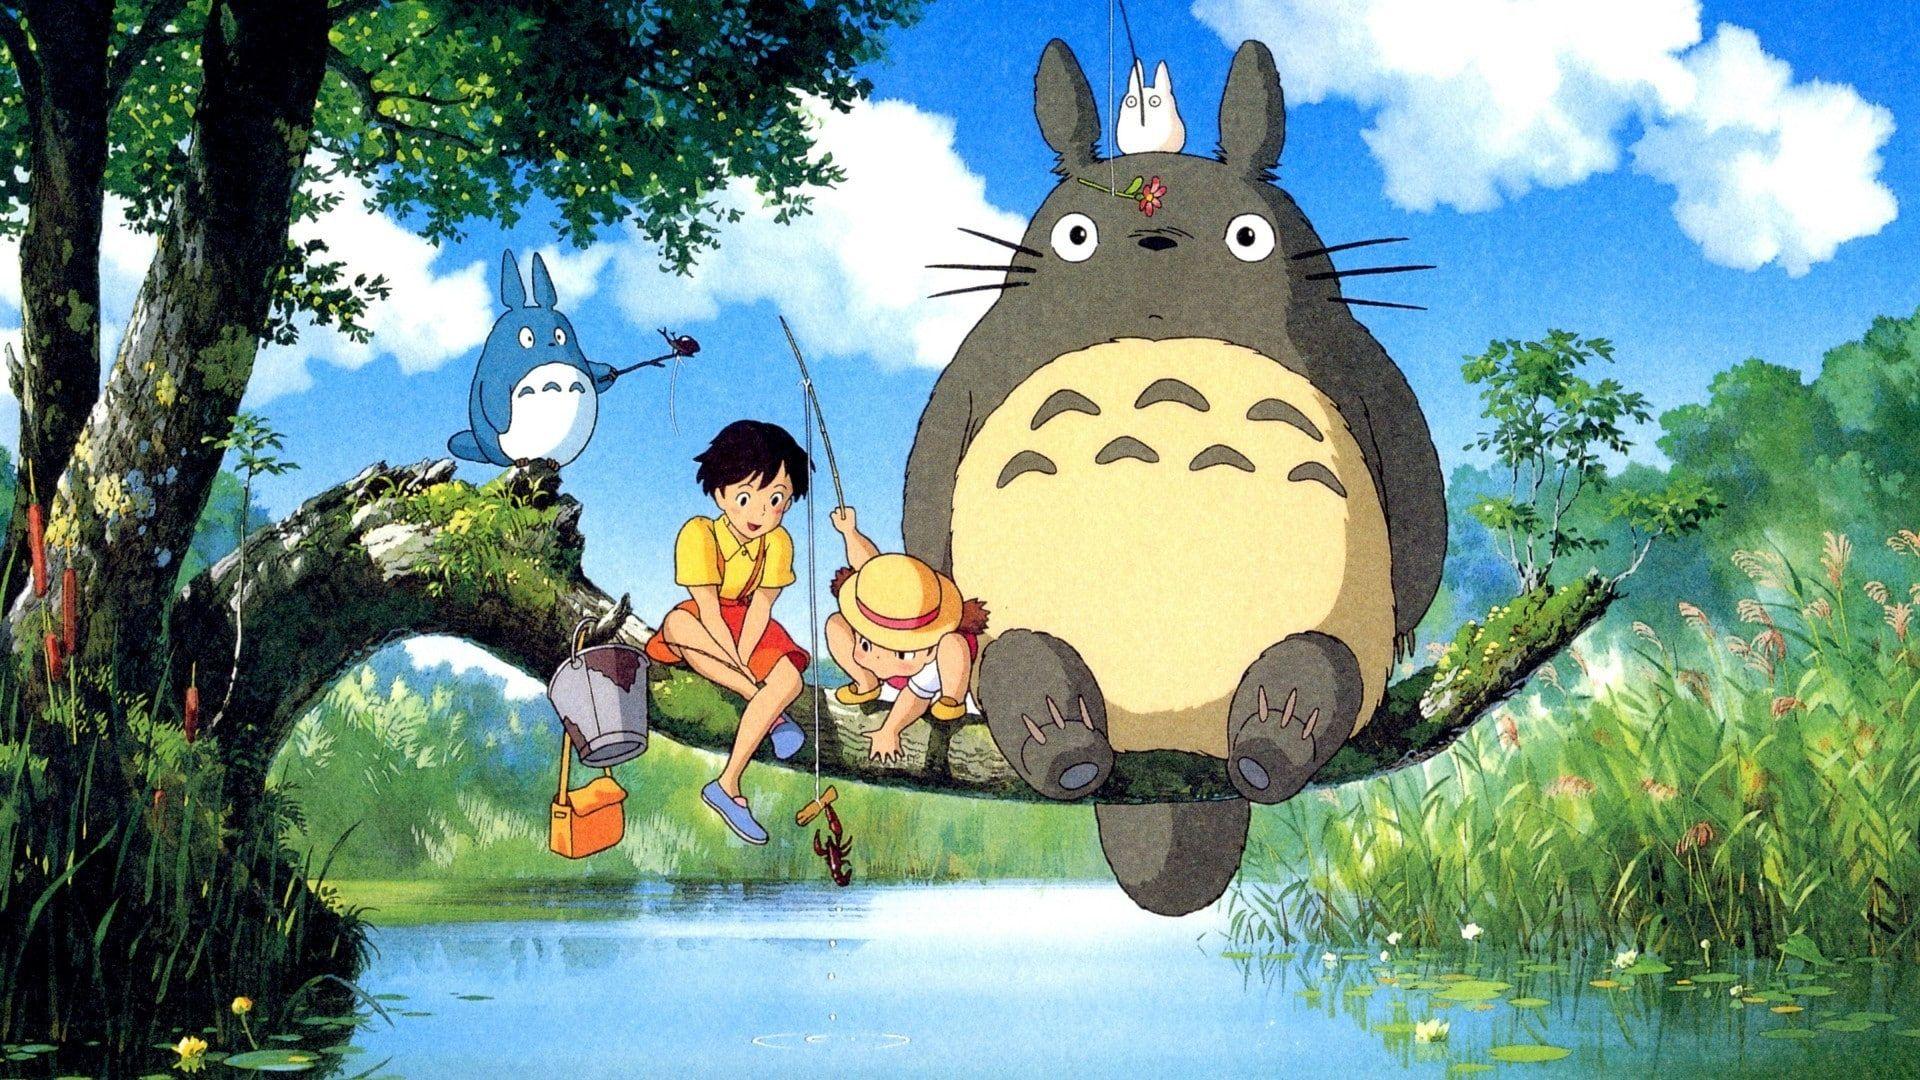 My Neighbor Totoro Studio Ghibli Totoro 1080p Wallpaper Hdwallpaper Desktop In 2020 Howls Moving Castle Wallpaper Studio Ghibli My Neighbor Totoro